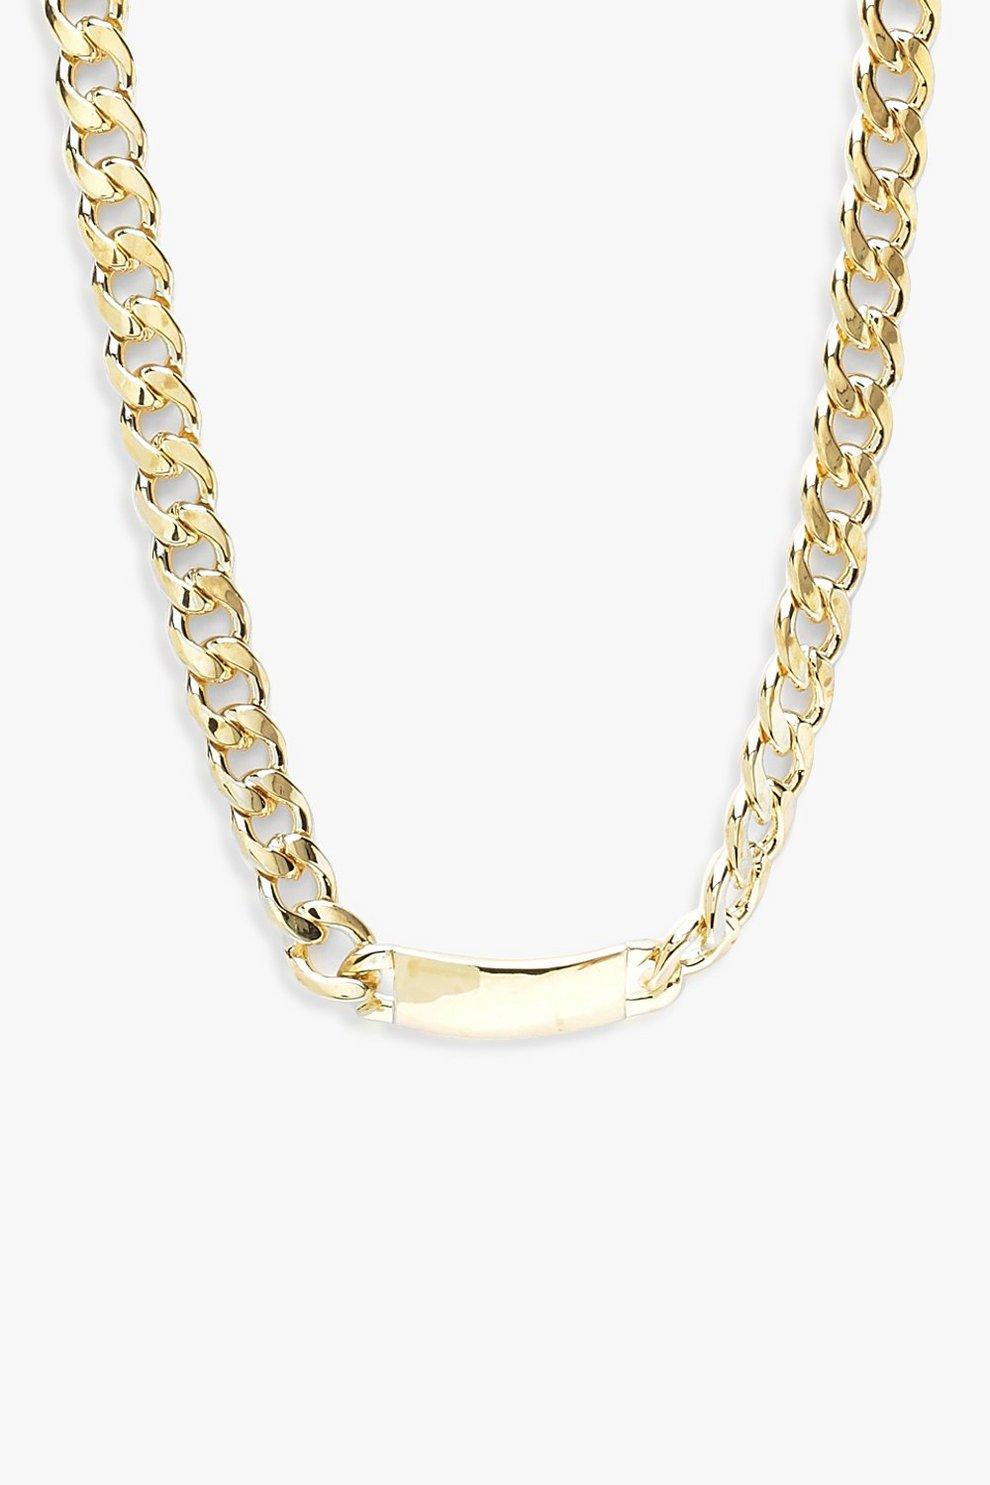 681e68b1916bb6 Chunky Bar Chain Necklace | Boohoo